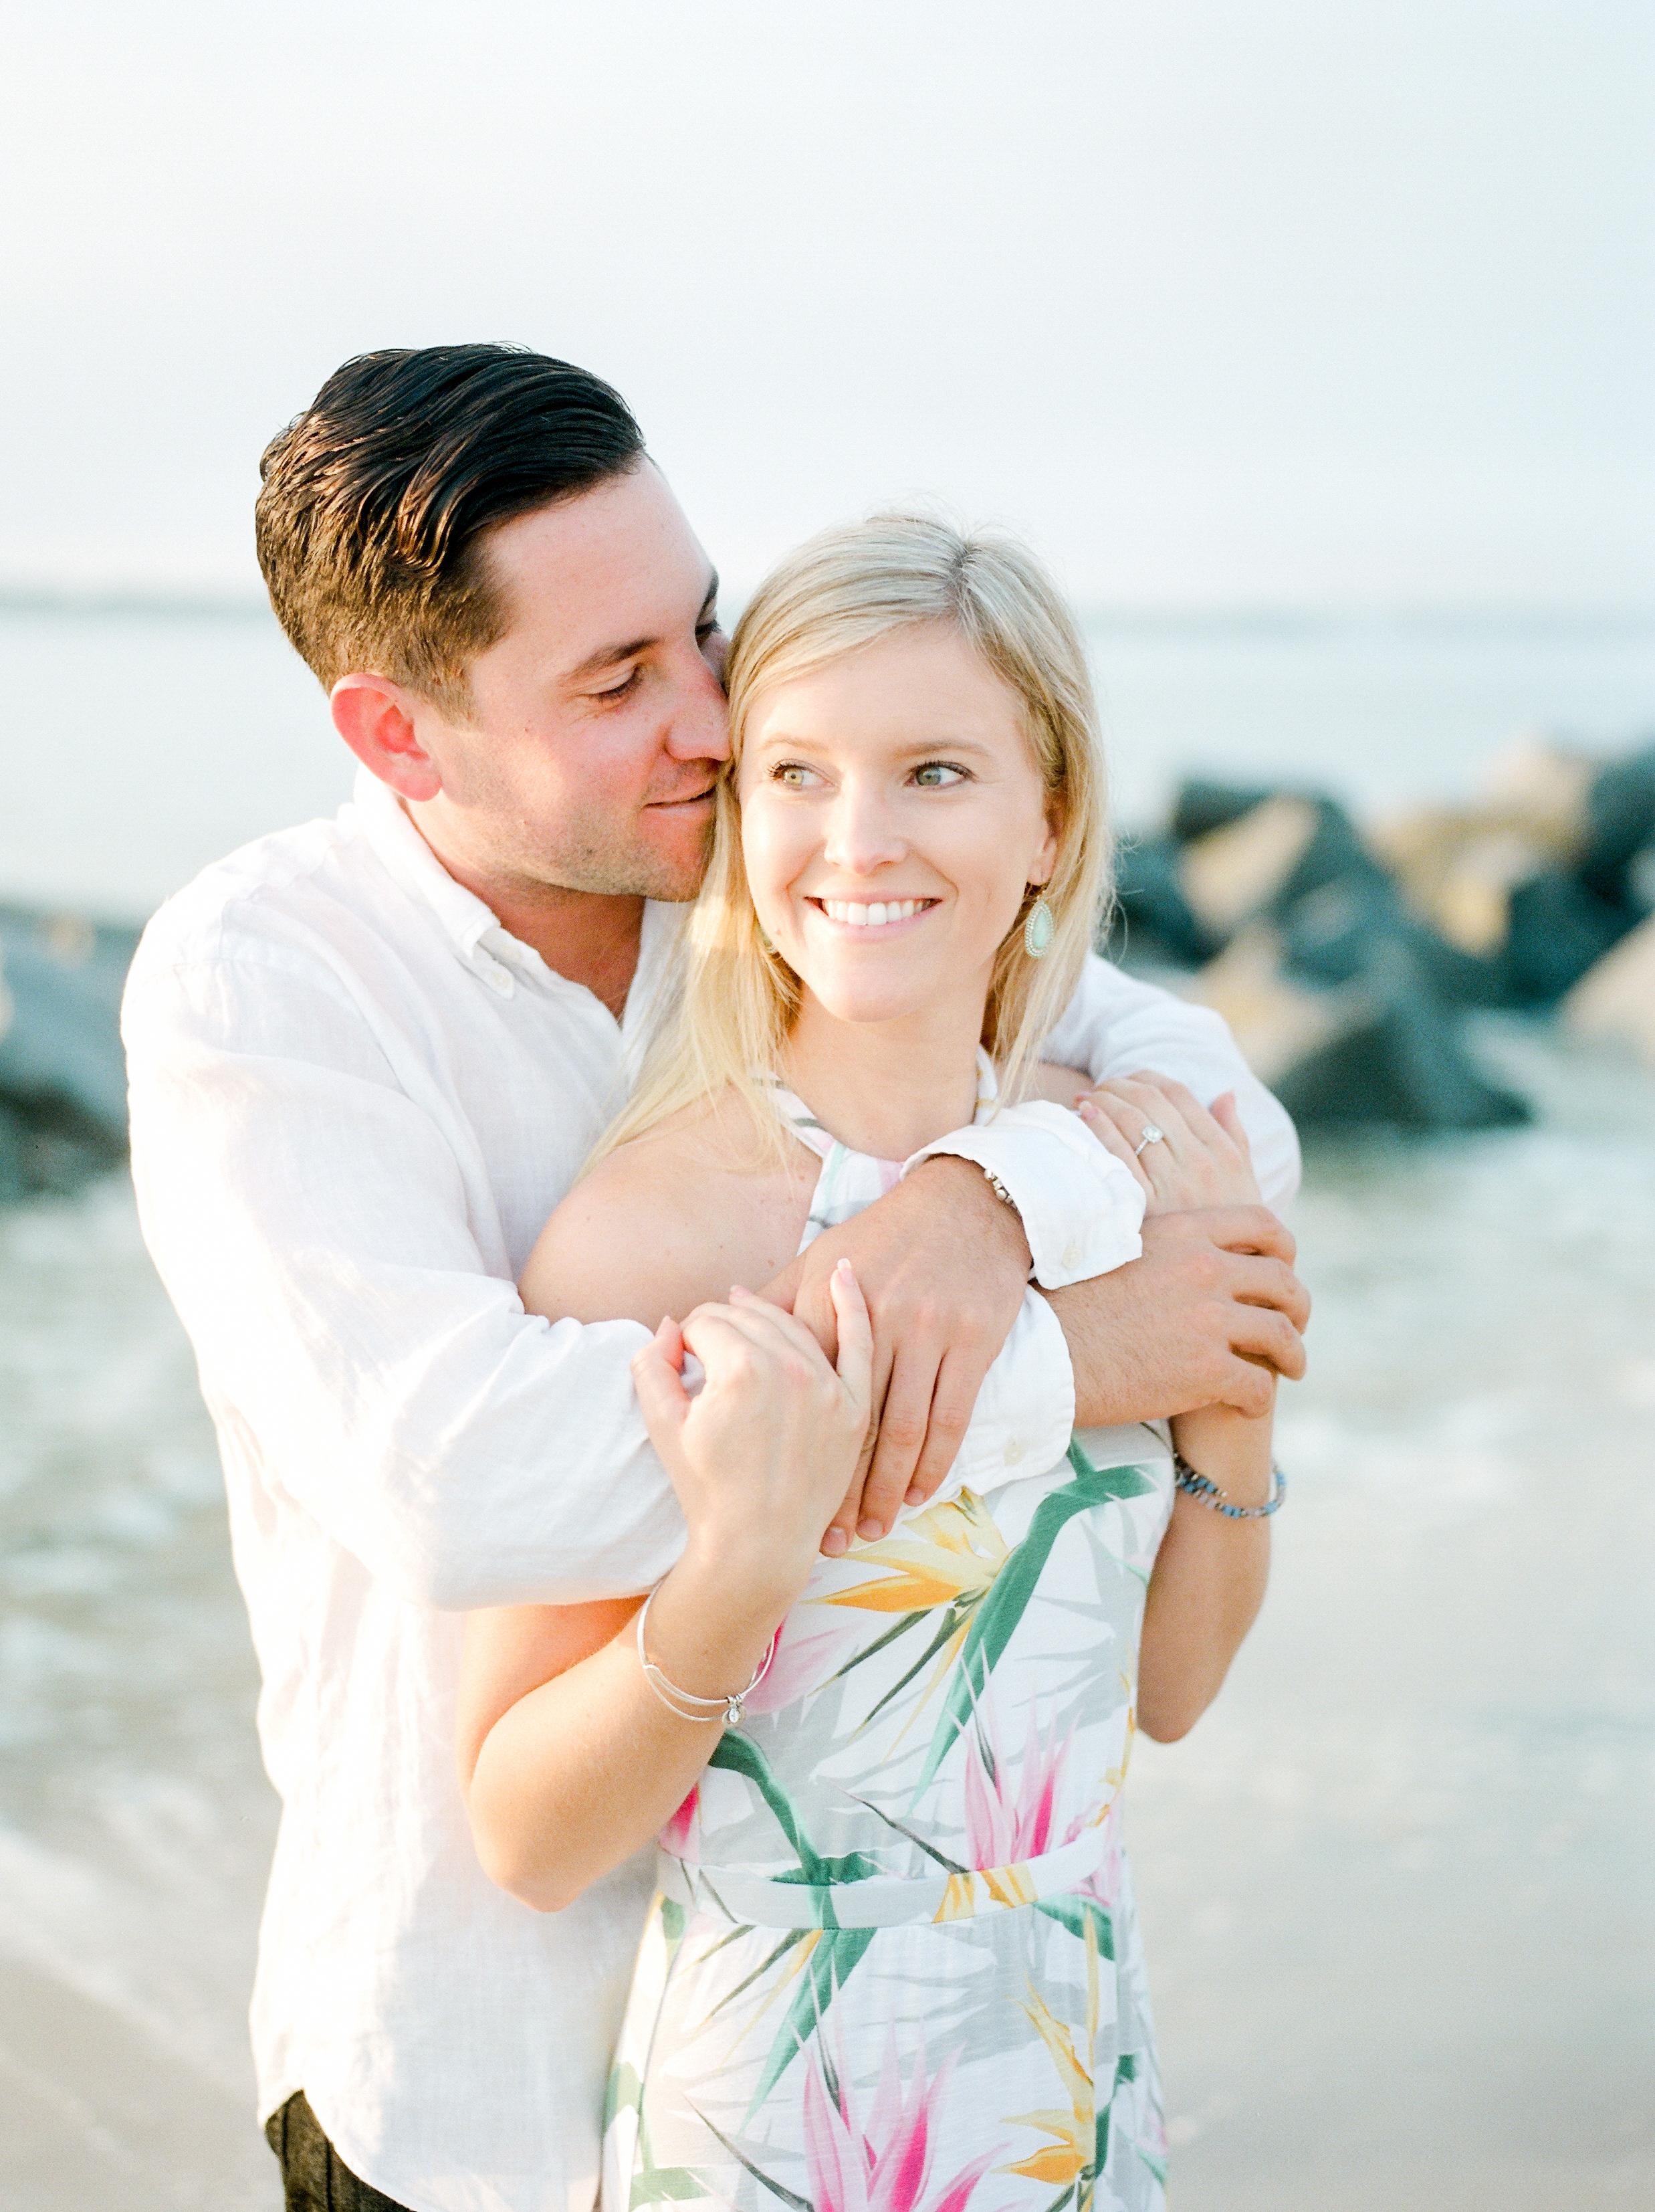 Lisa Silva Photography- Jacksonville, Florida Fine Art Film Wedding Photography 4.jpg